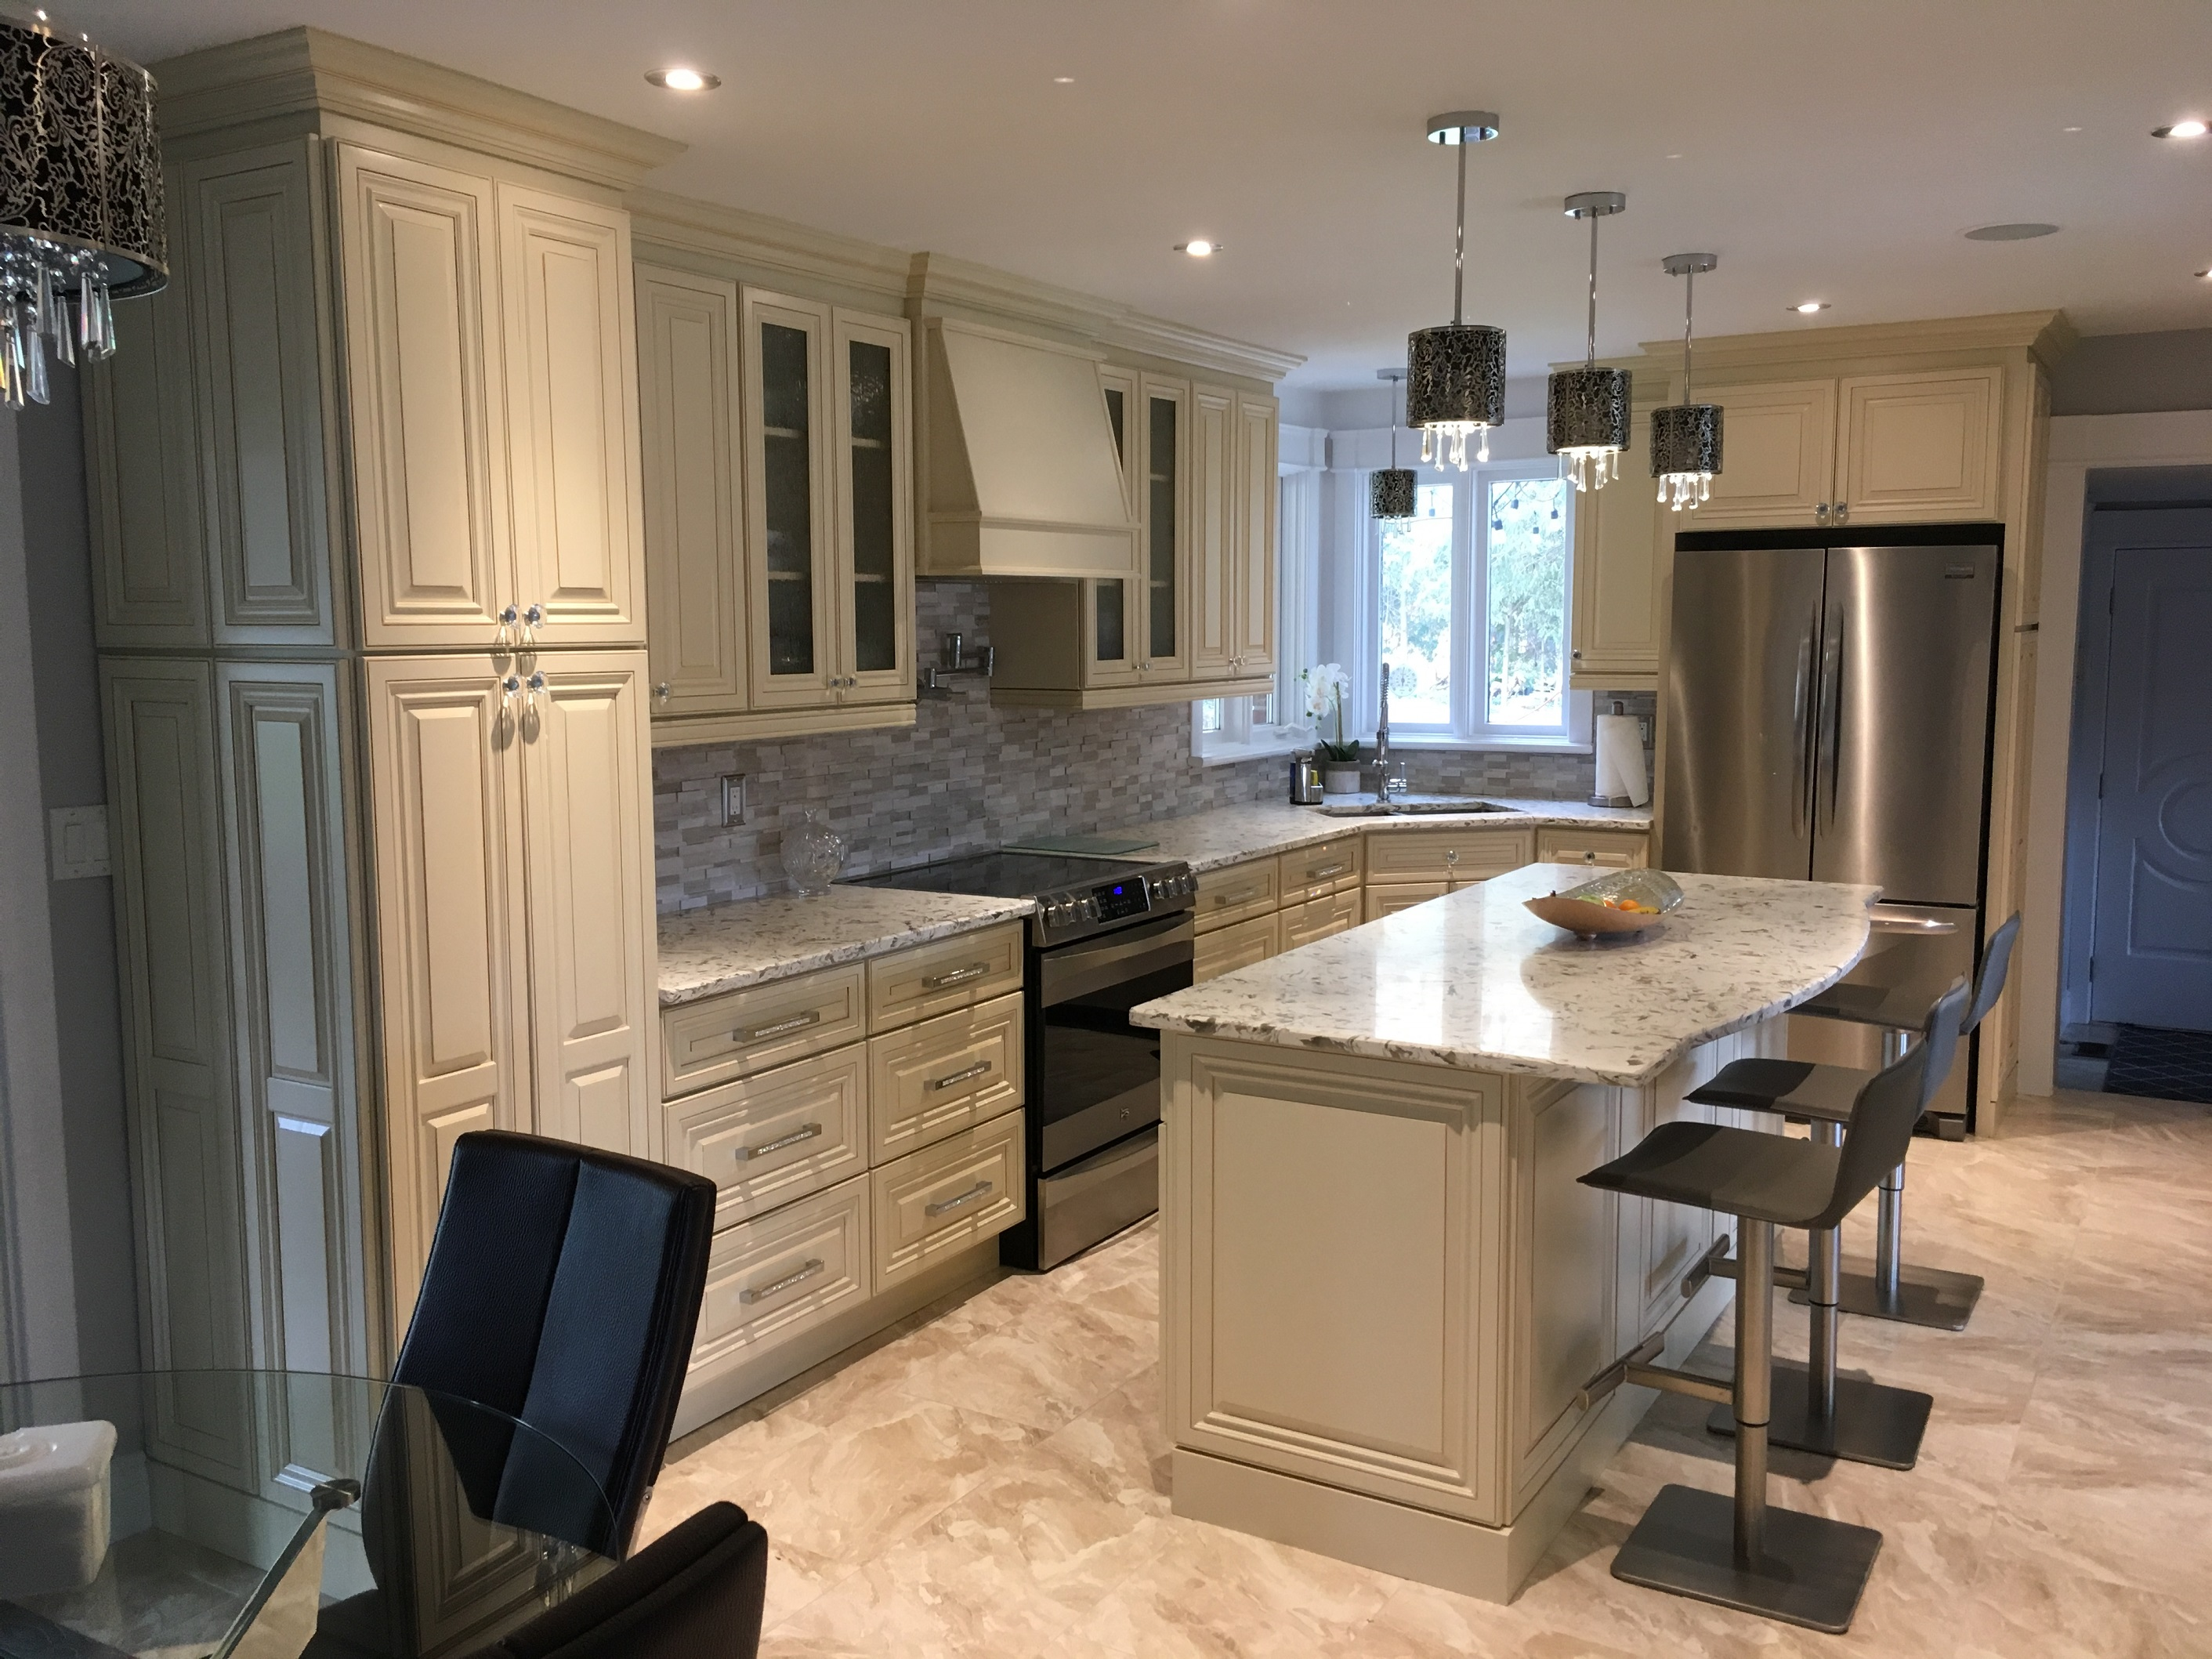 Kitchen Cabinets London 12